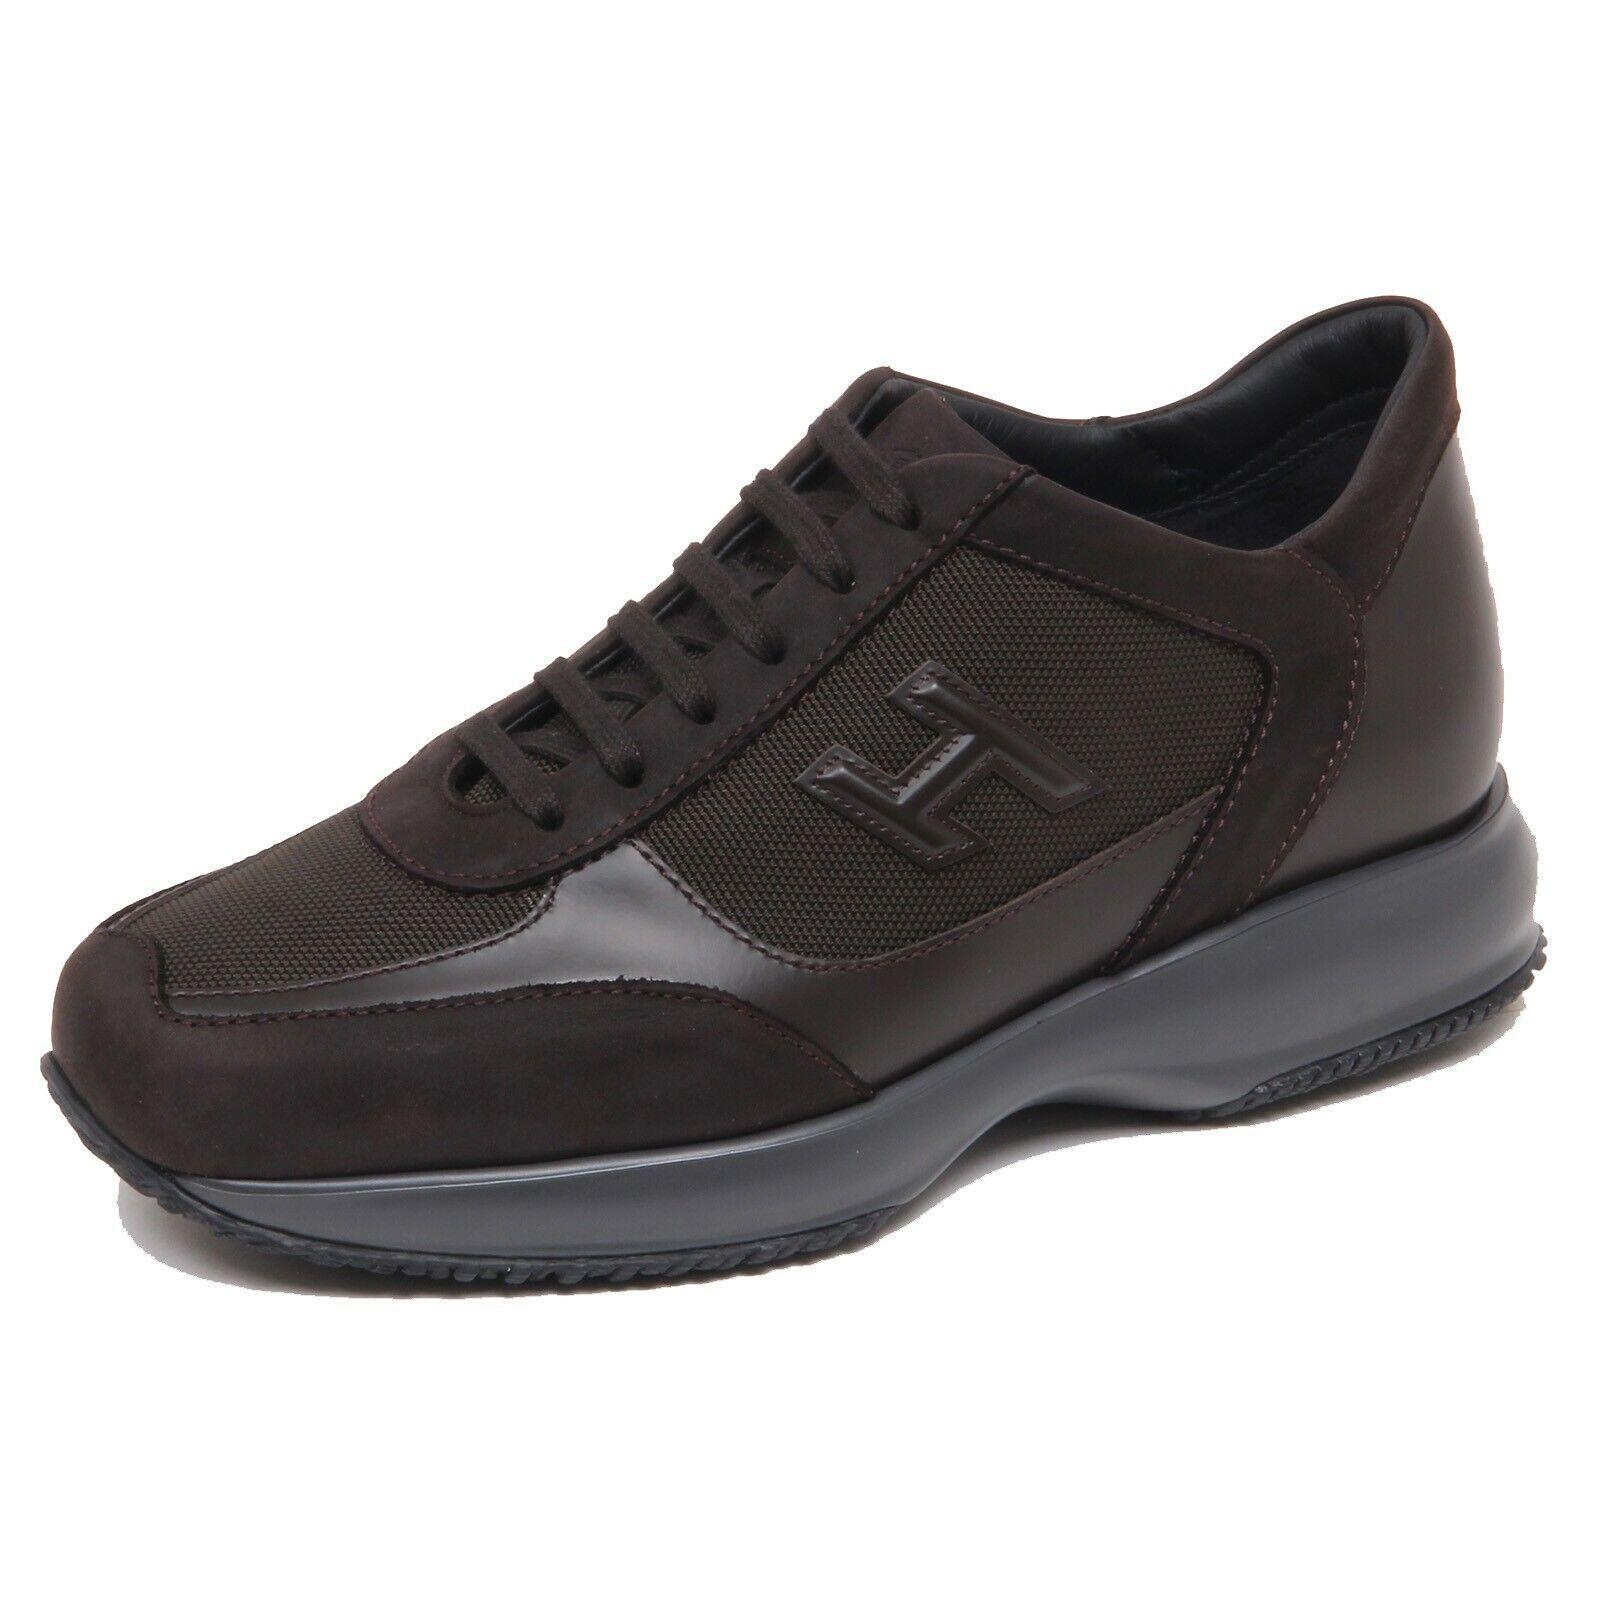 F6798 scarpe da ginnastica uomo dark Marronee HOGAN NEW INTERACTIVE scarpe H 3D scarpe man